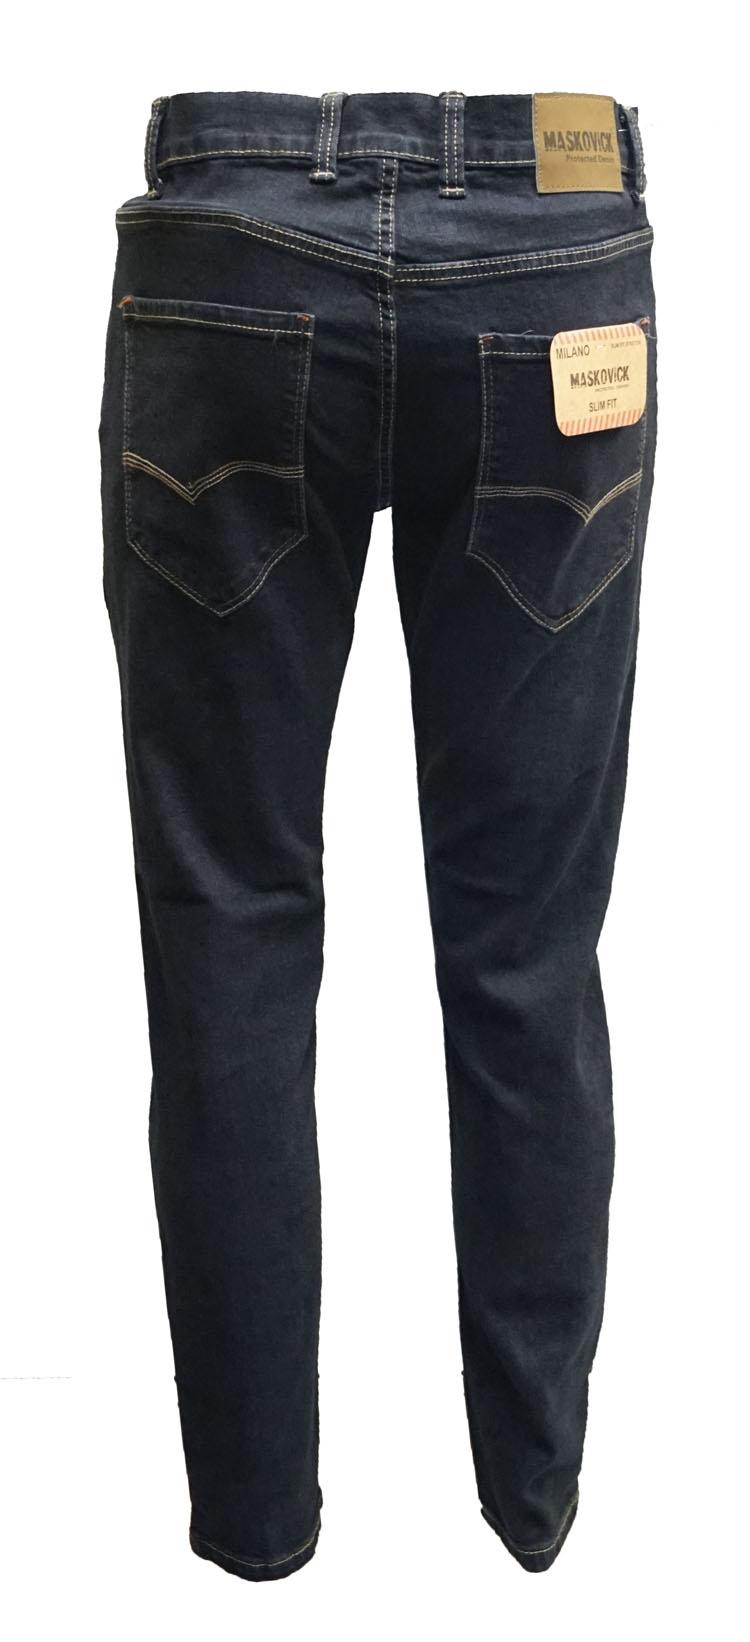 "Maskovick stretch jeans  "" Milano slim fit "" Blue black"